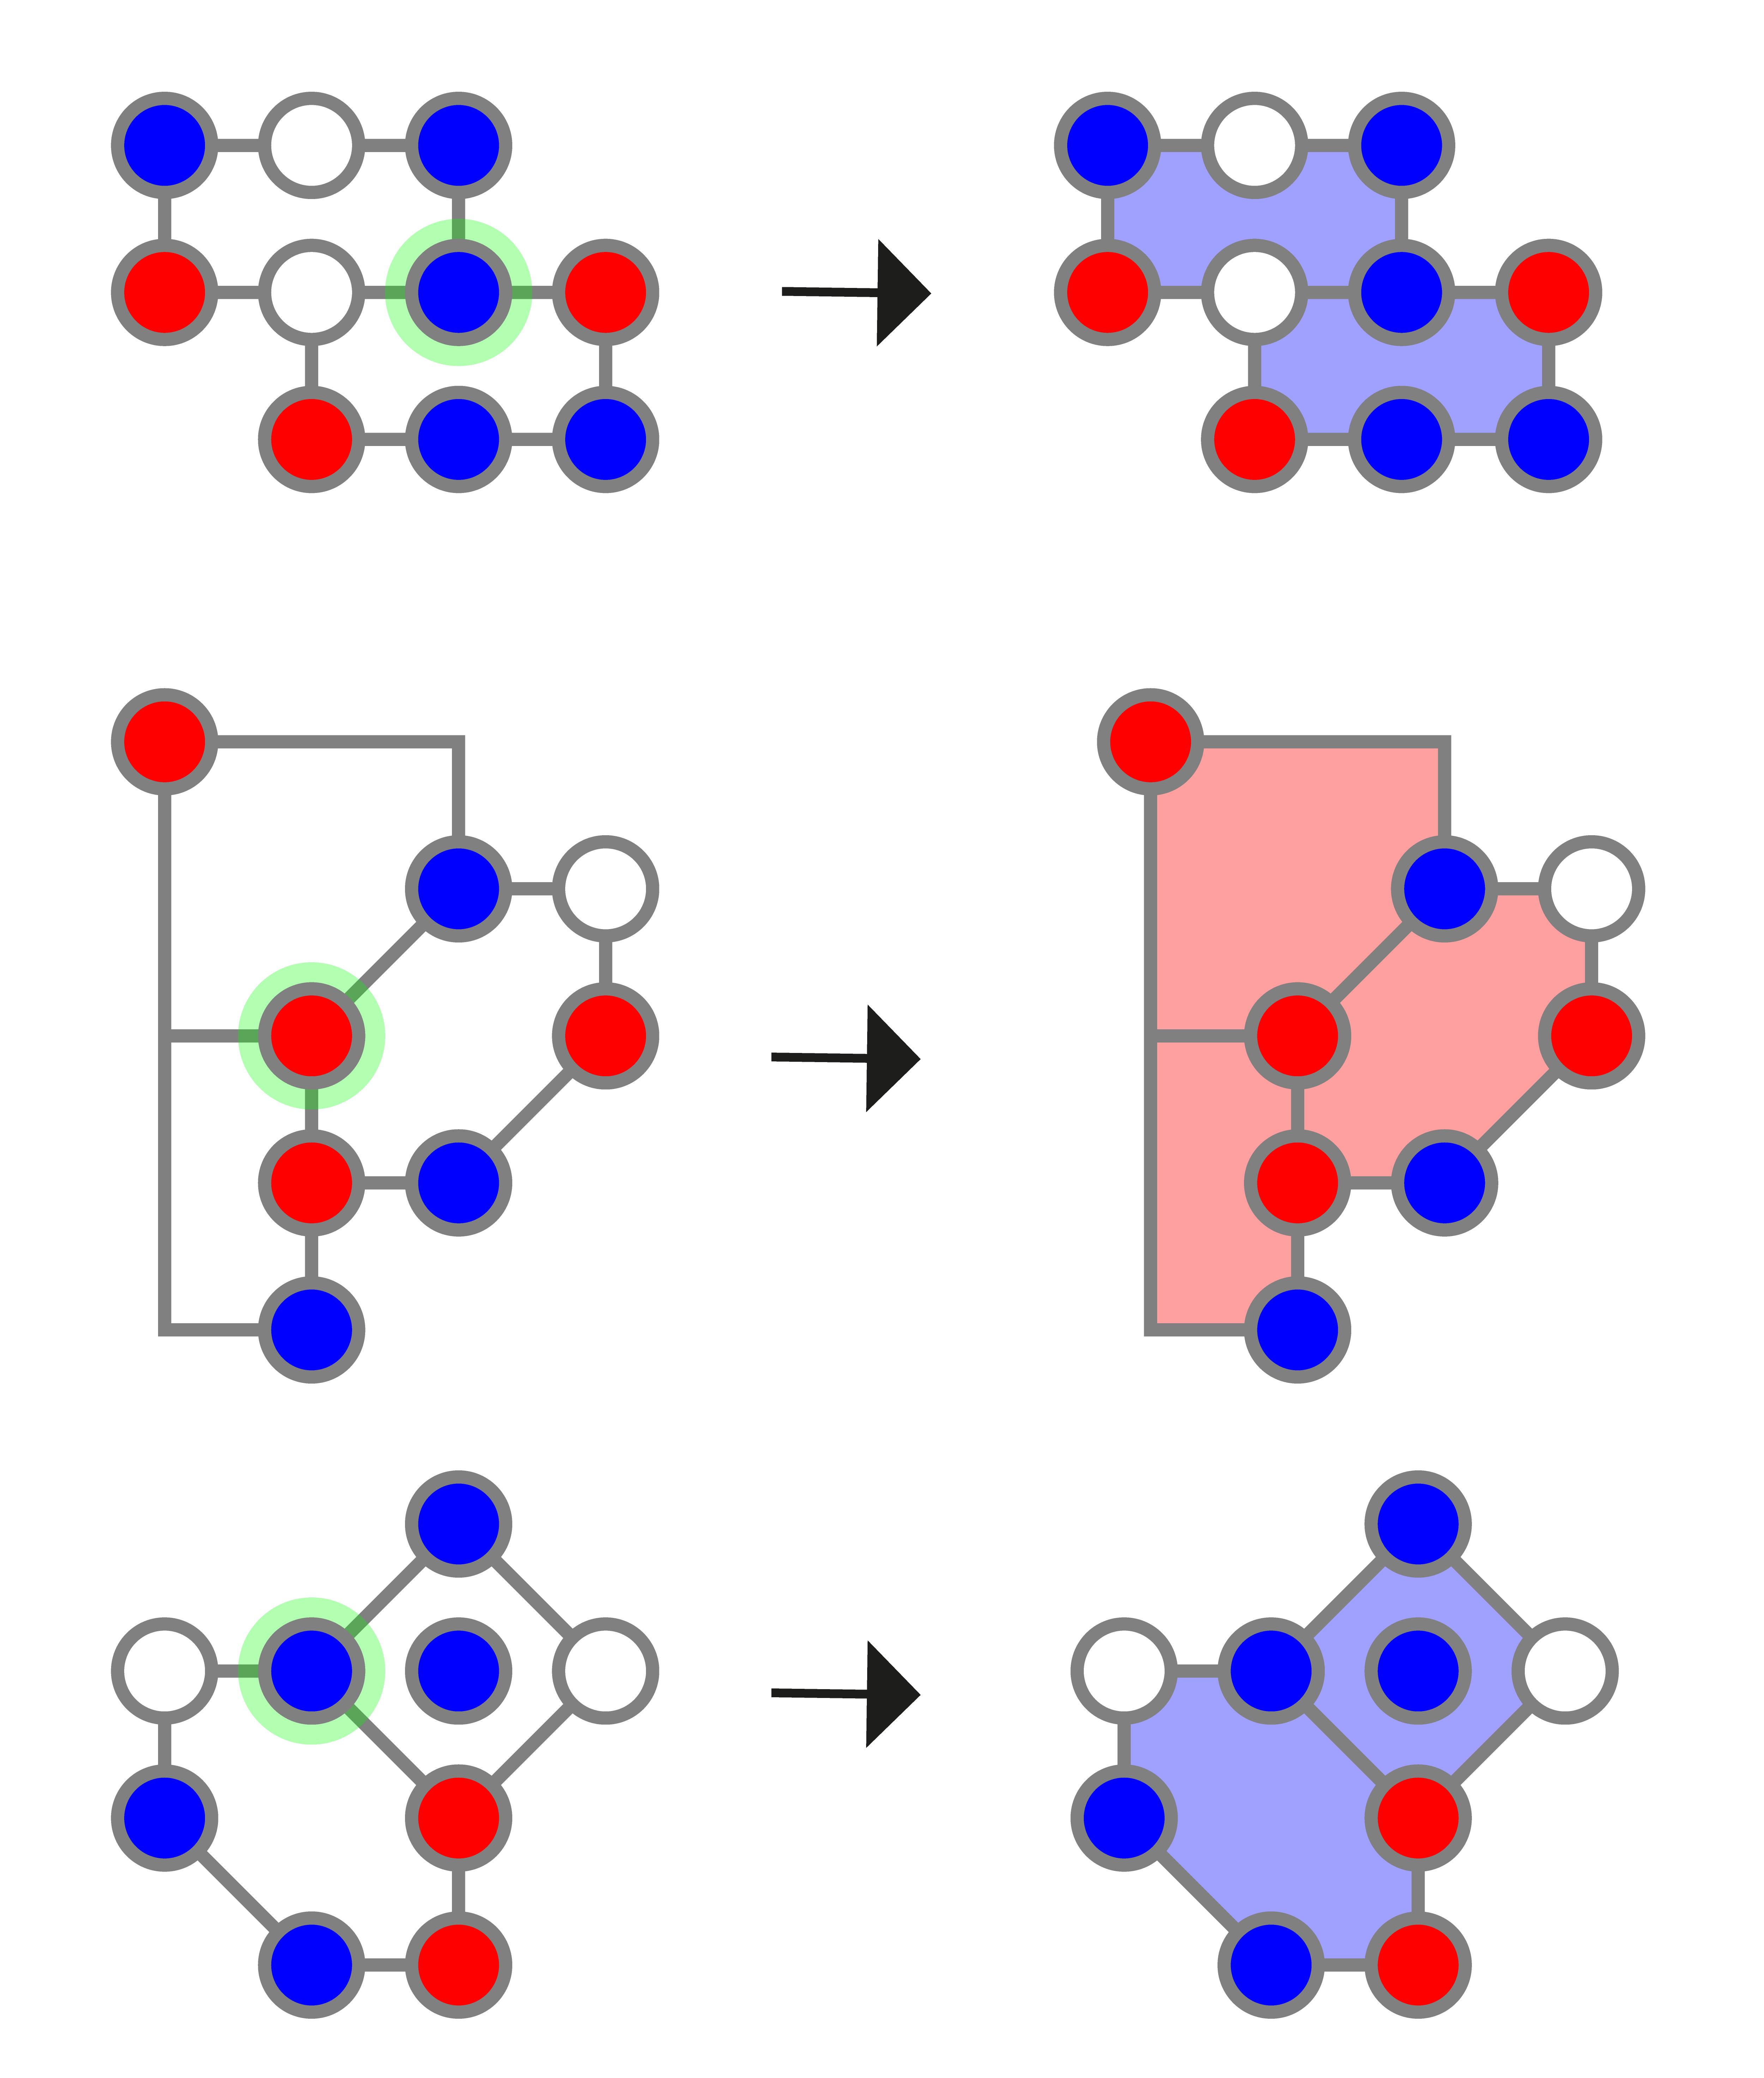 conhex-diagram 2-01